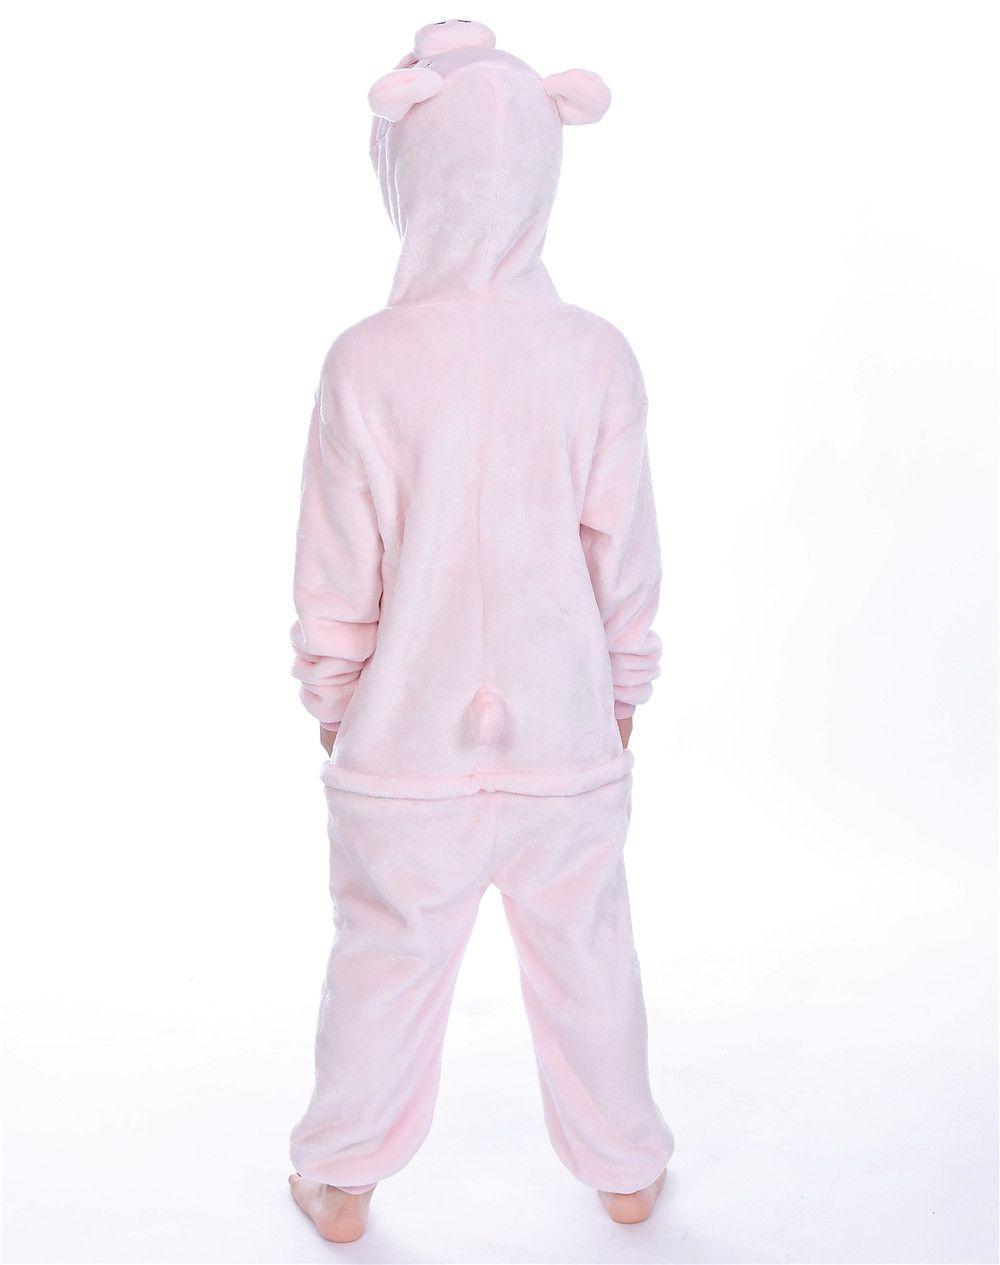 Winter Pajamas for kids Flannel Baby Boy Cartoon Pink Pig Animal Onesie Sleepwear School Party Cosplay MX-024